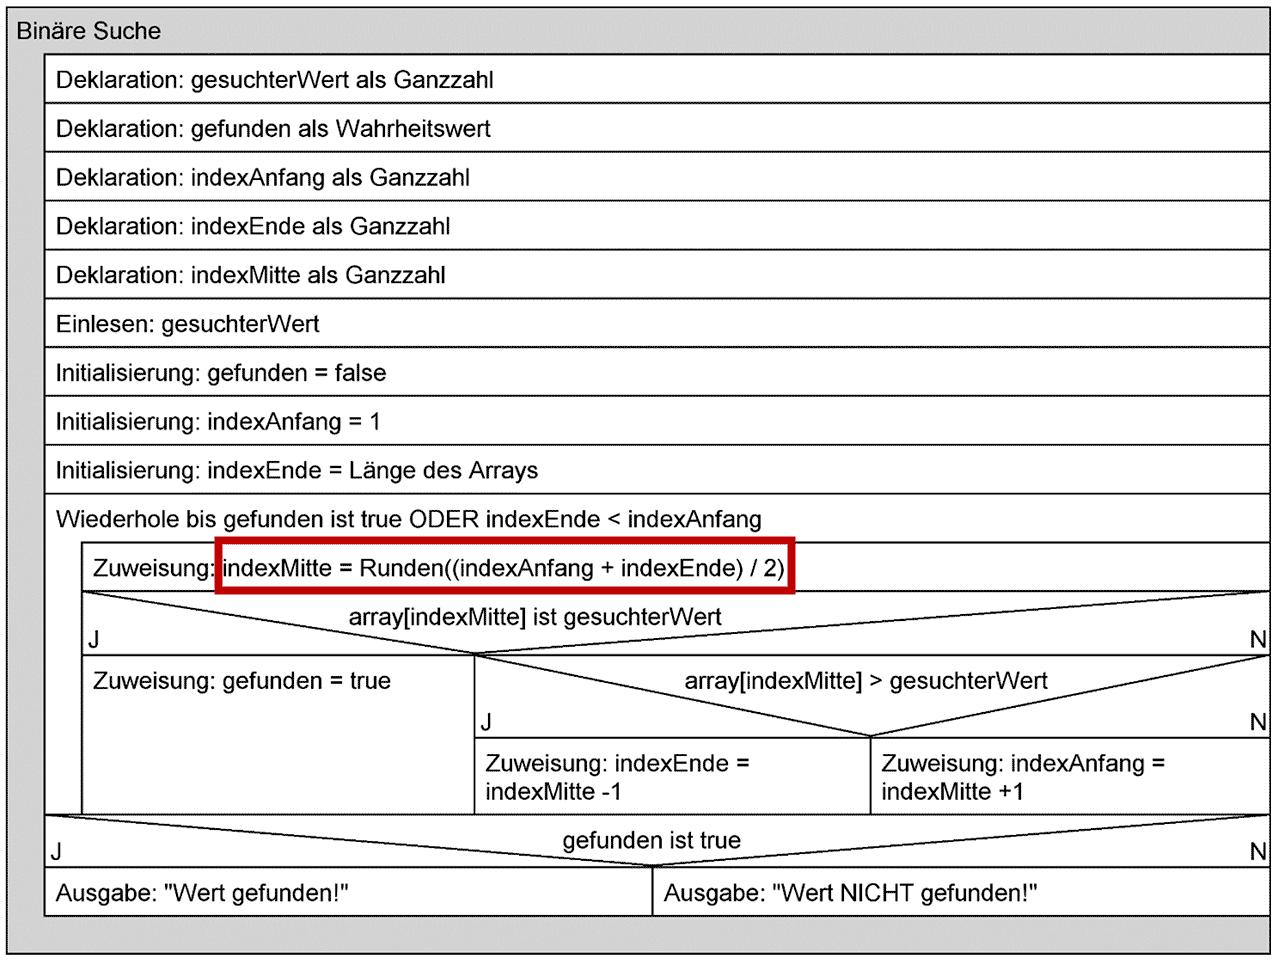 Struktogramm: Binäre Suche